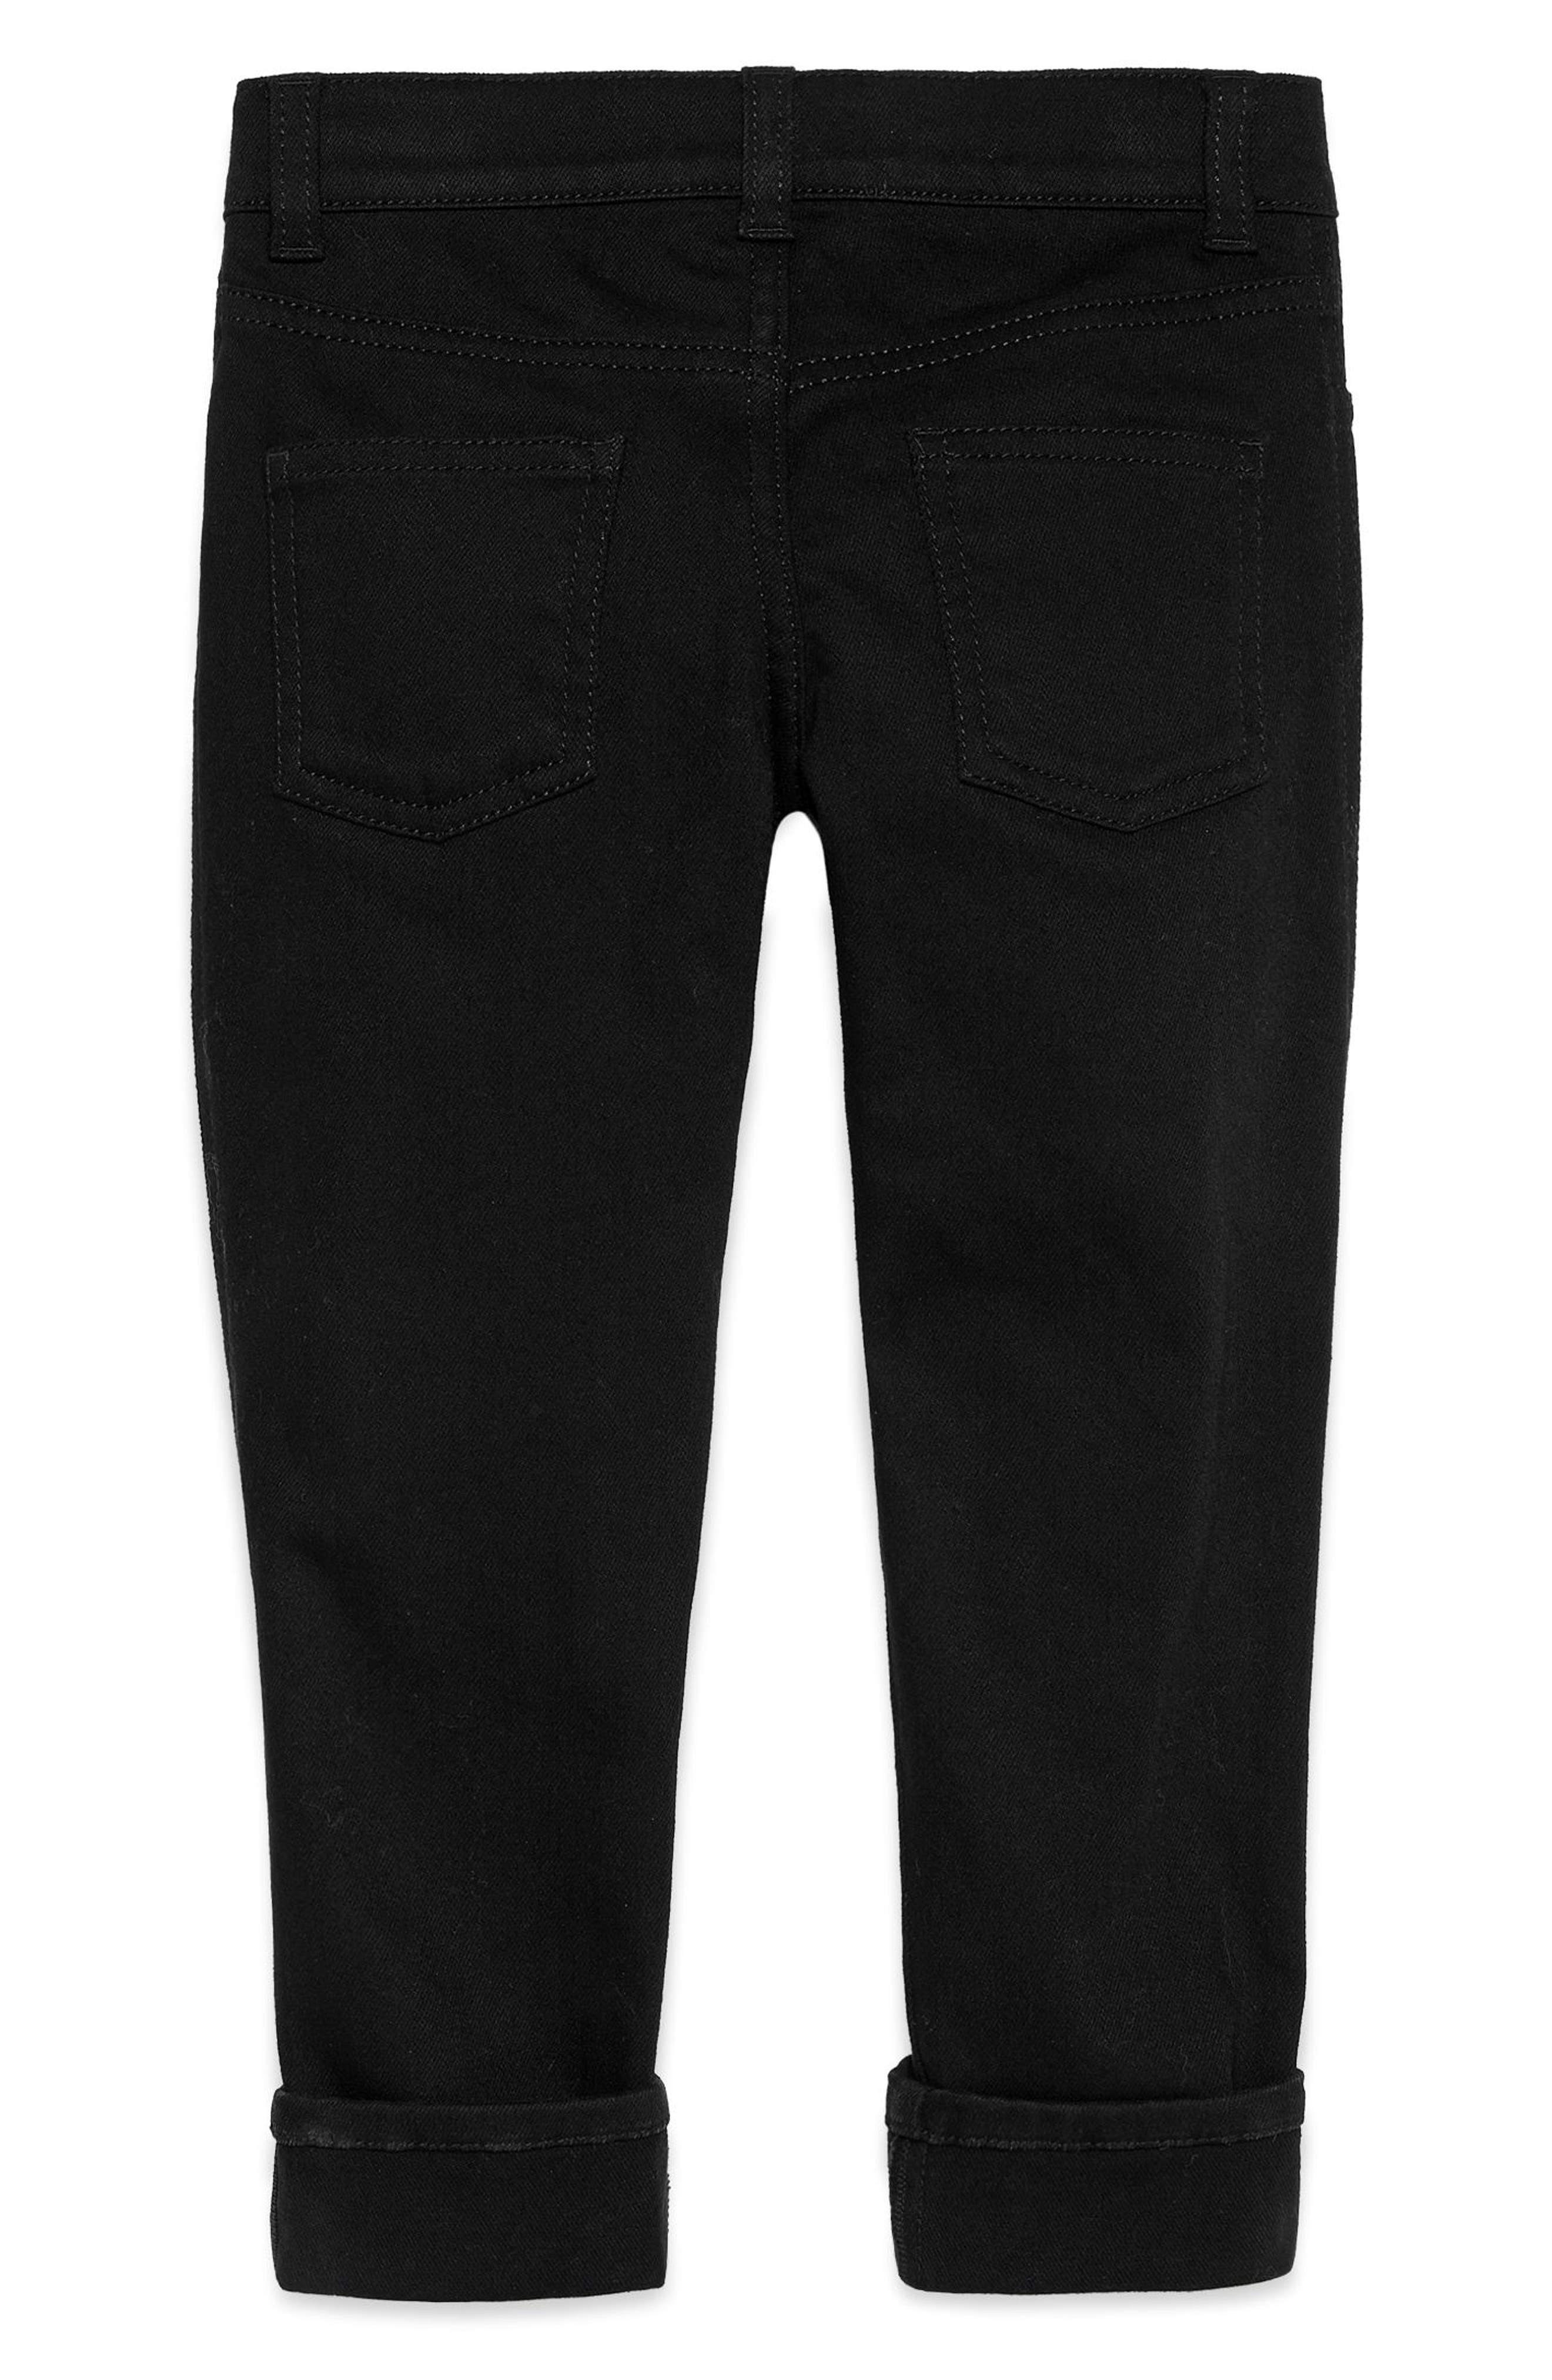 Straight Leg Pants,                             Alternate thumbnail 2, color,                             BLACK/ GREEN/ RED